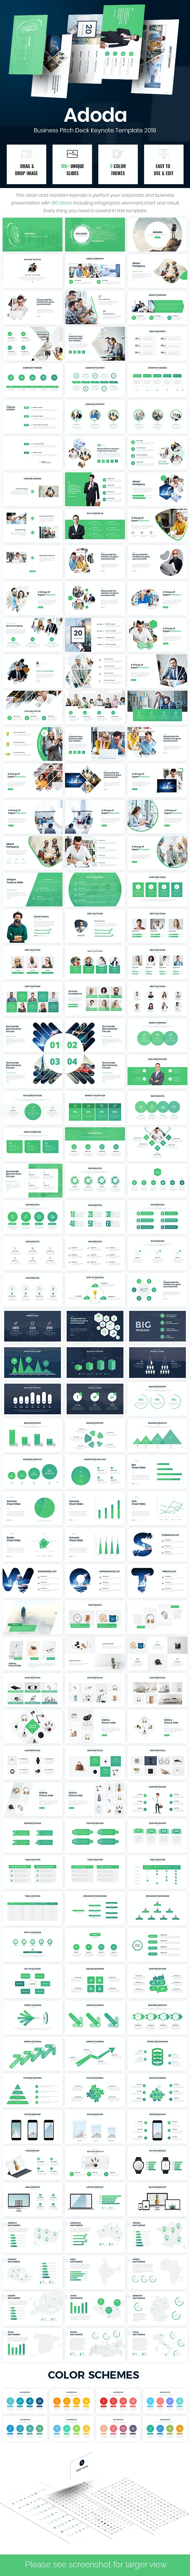 Adoda - Business Pitch Deck Keynote Template 2019 - Business PowerPoint Templates